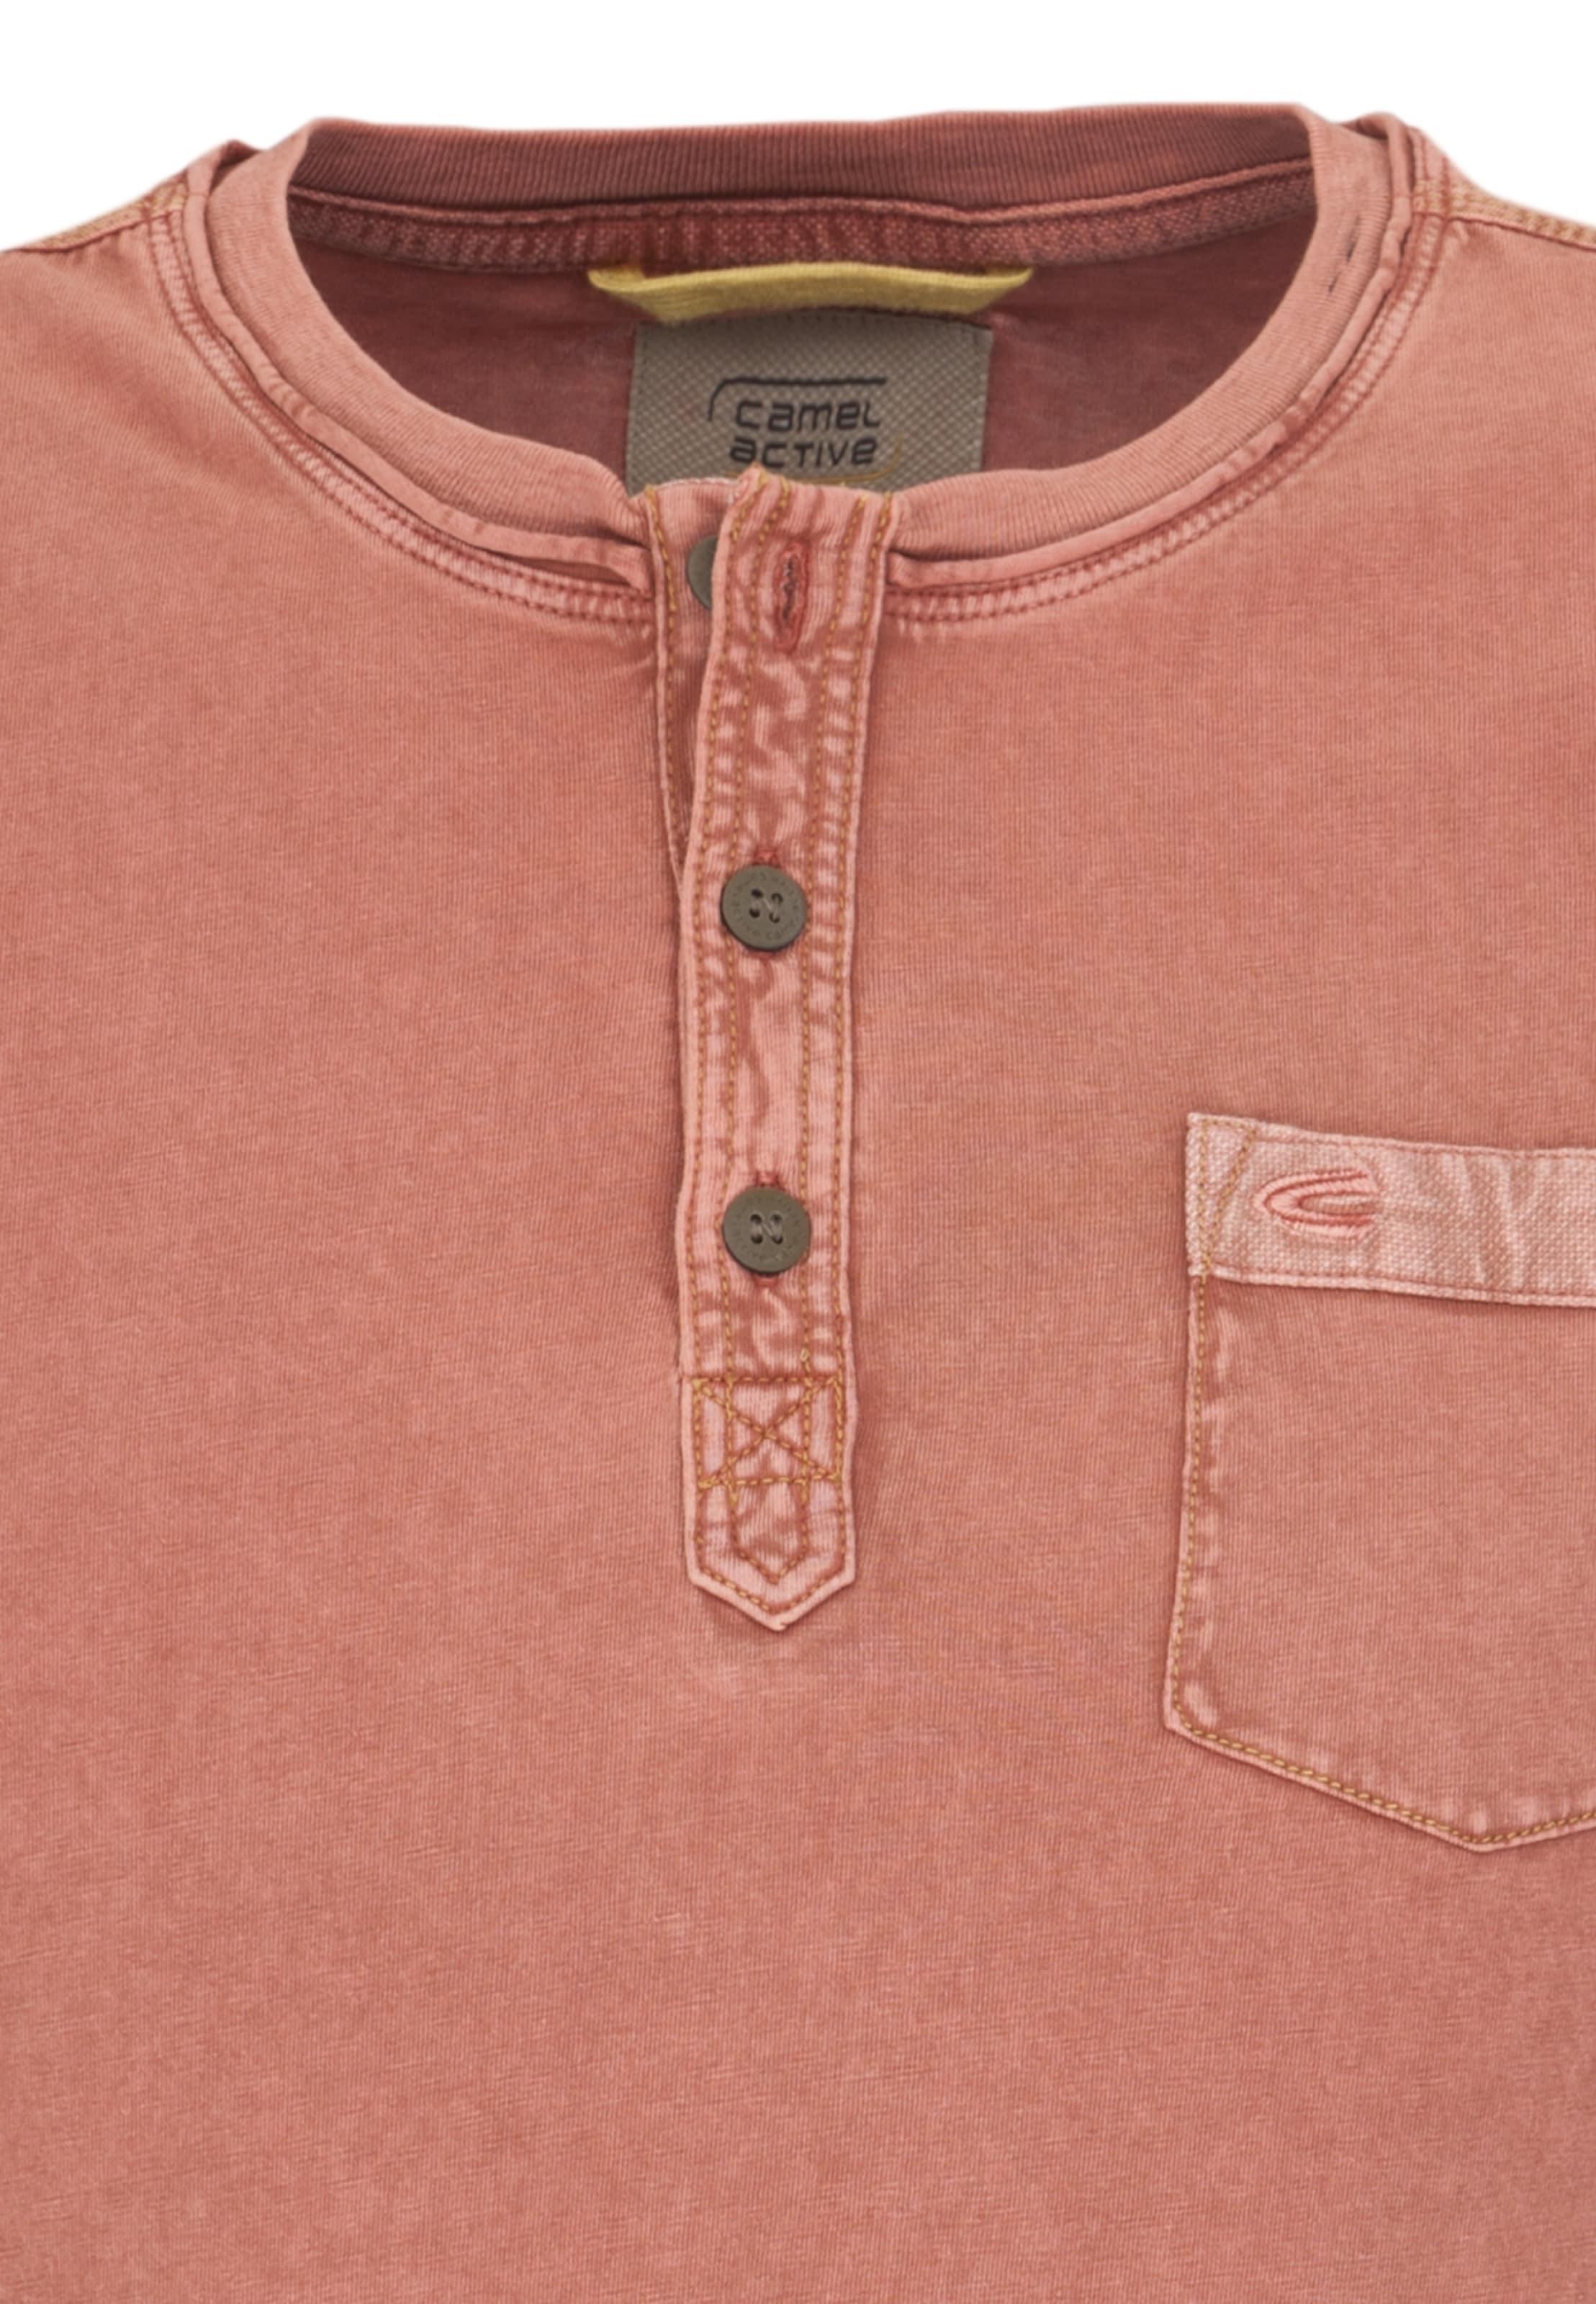 T In shirt Camel Orangemeliert Active lFcJTK1